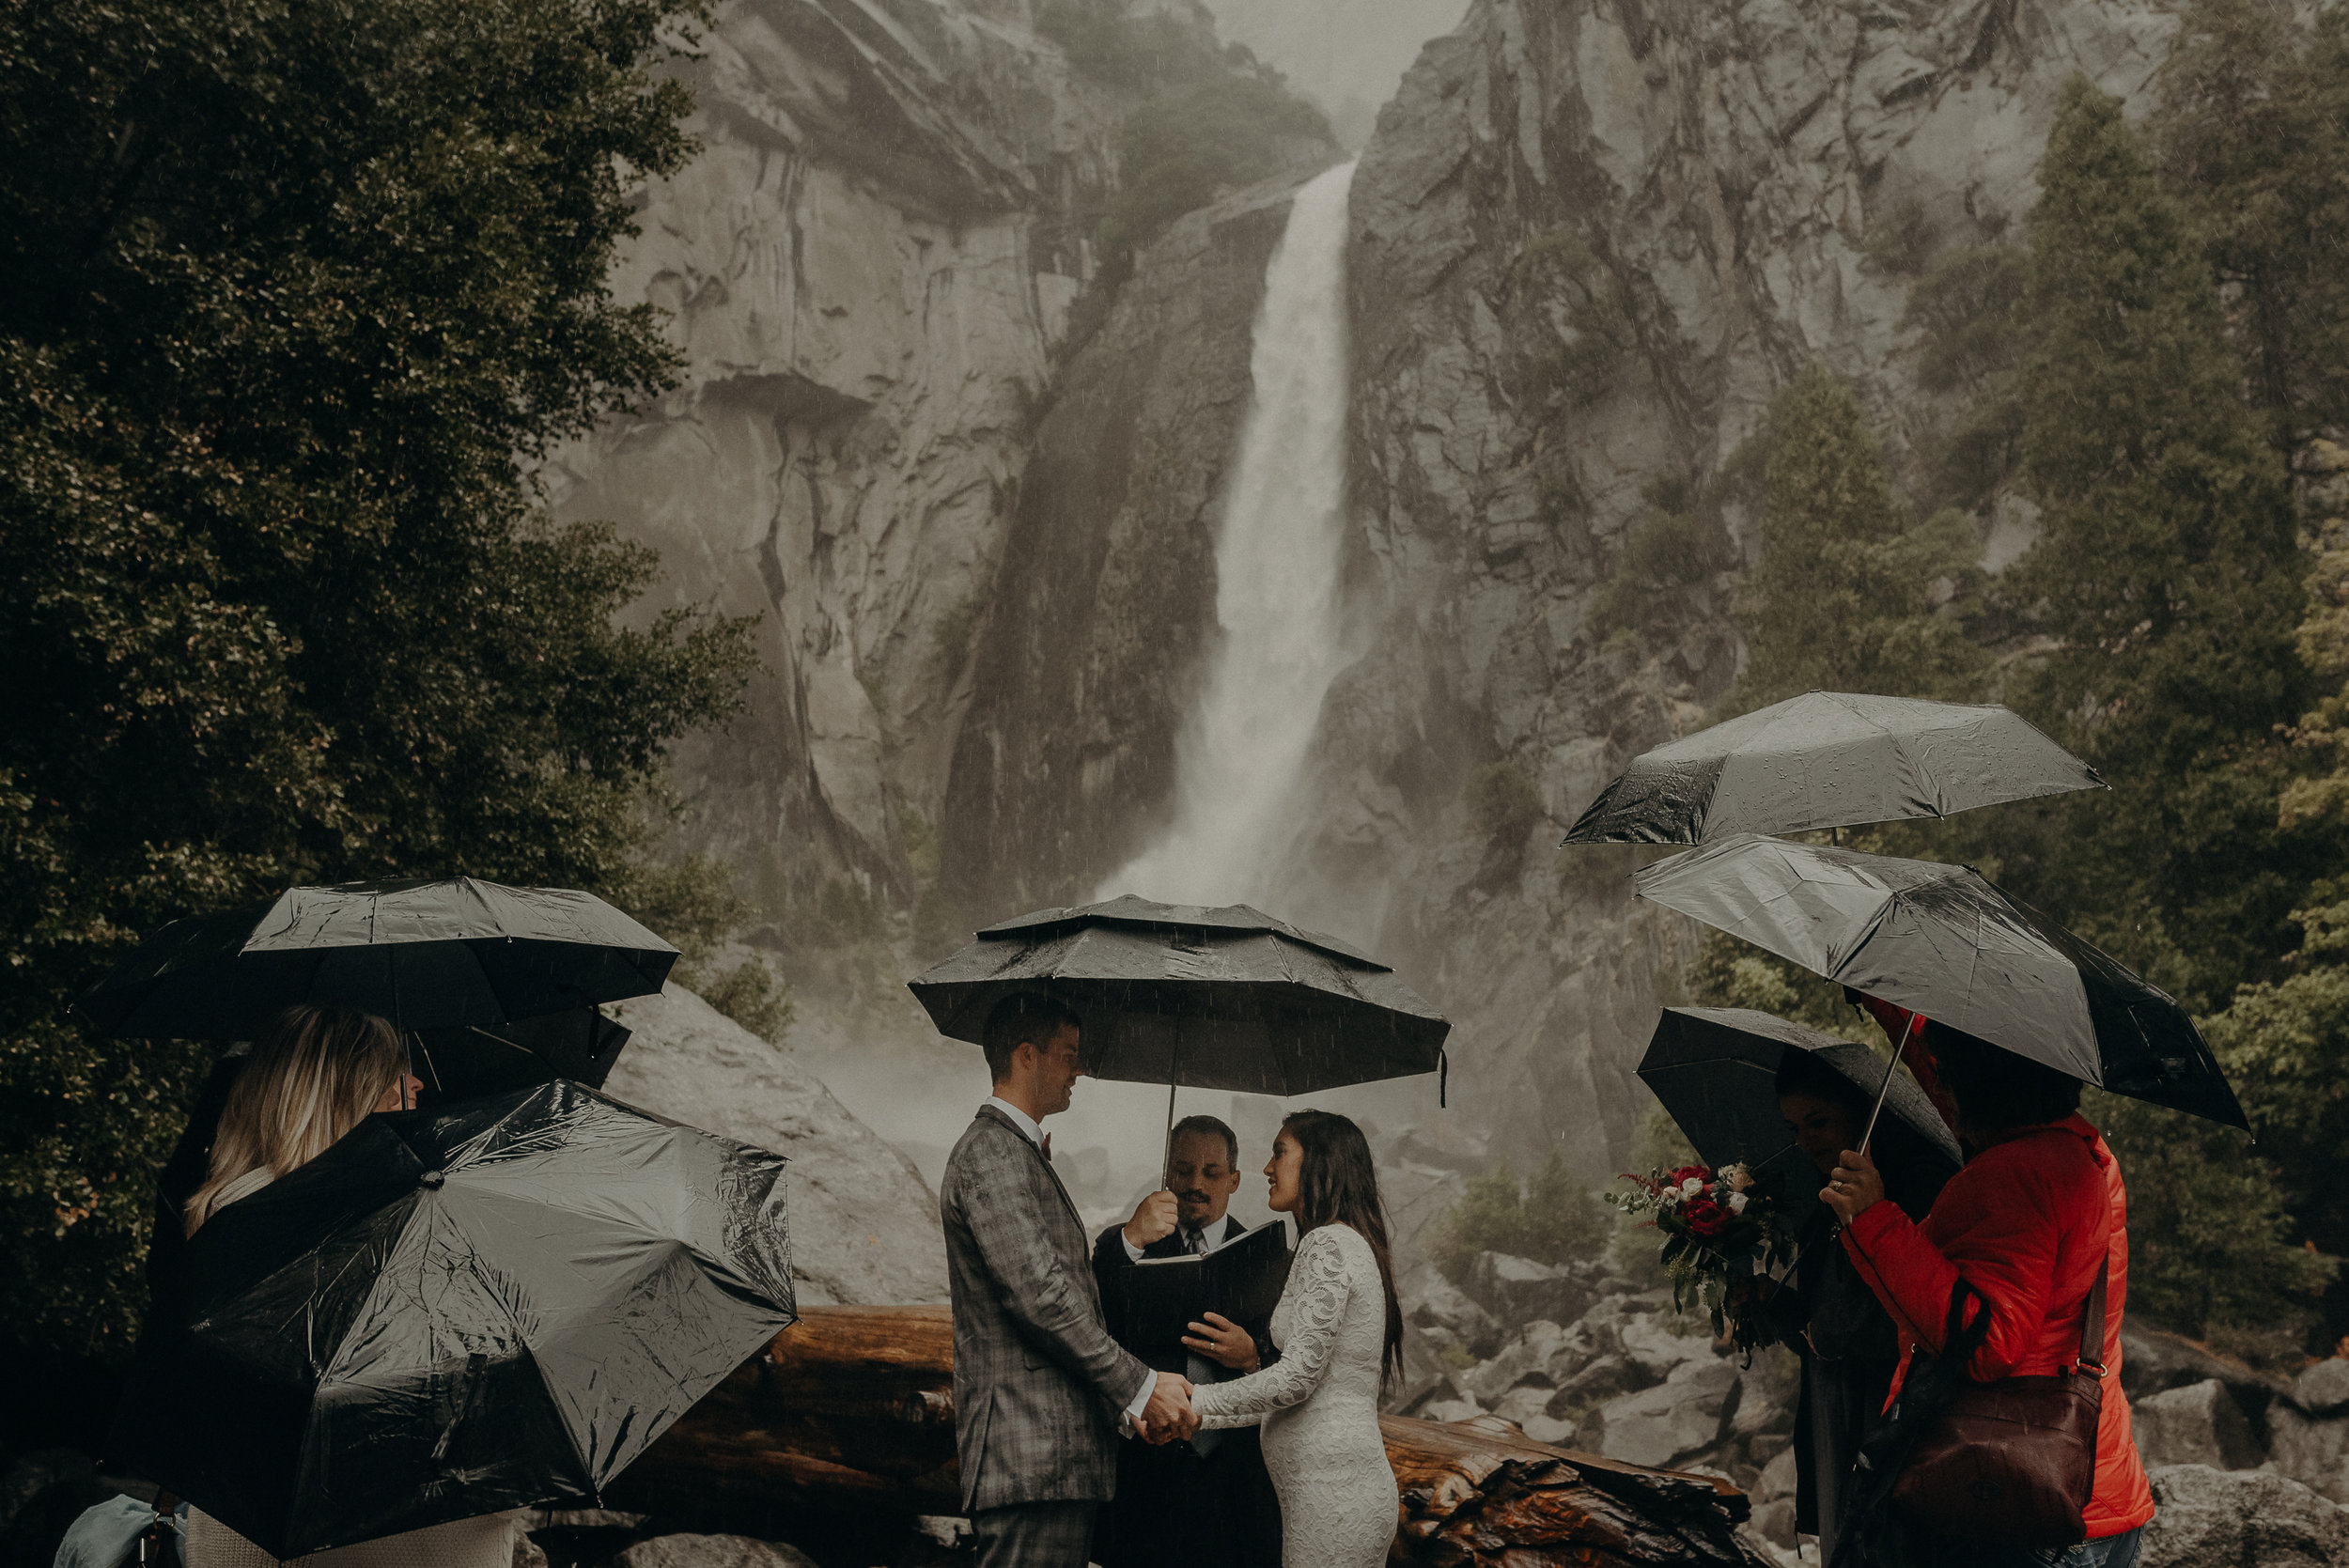 Isaiah + Taylor Photography - Yosemite Elopement - Los Angeles Wedding Photographer-34.jpg